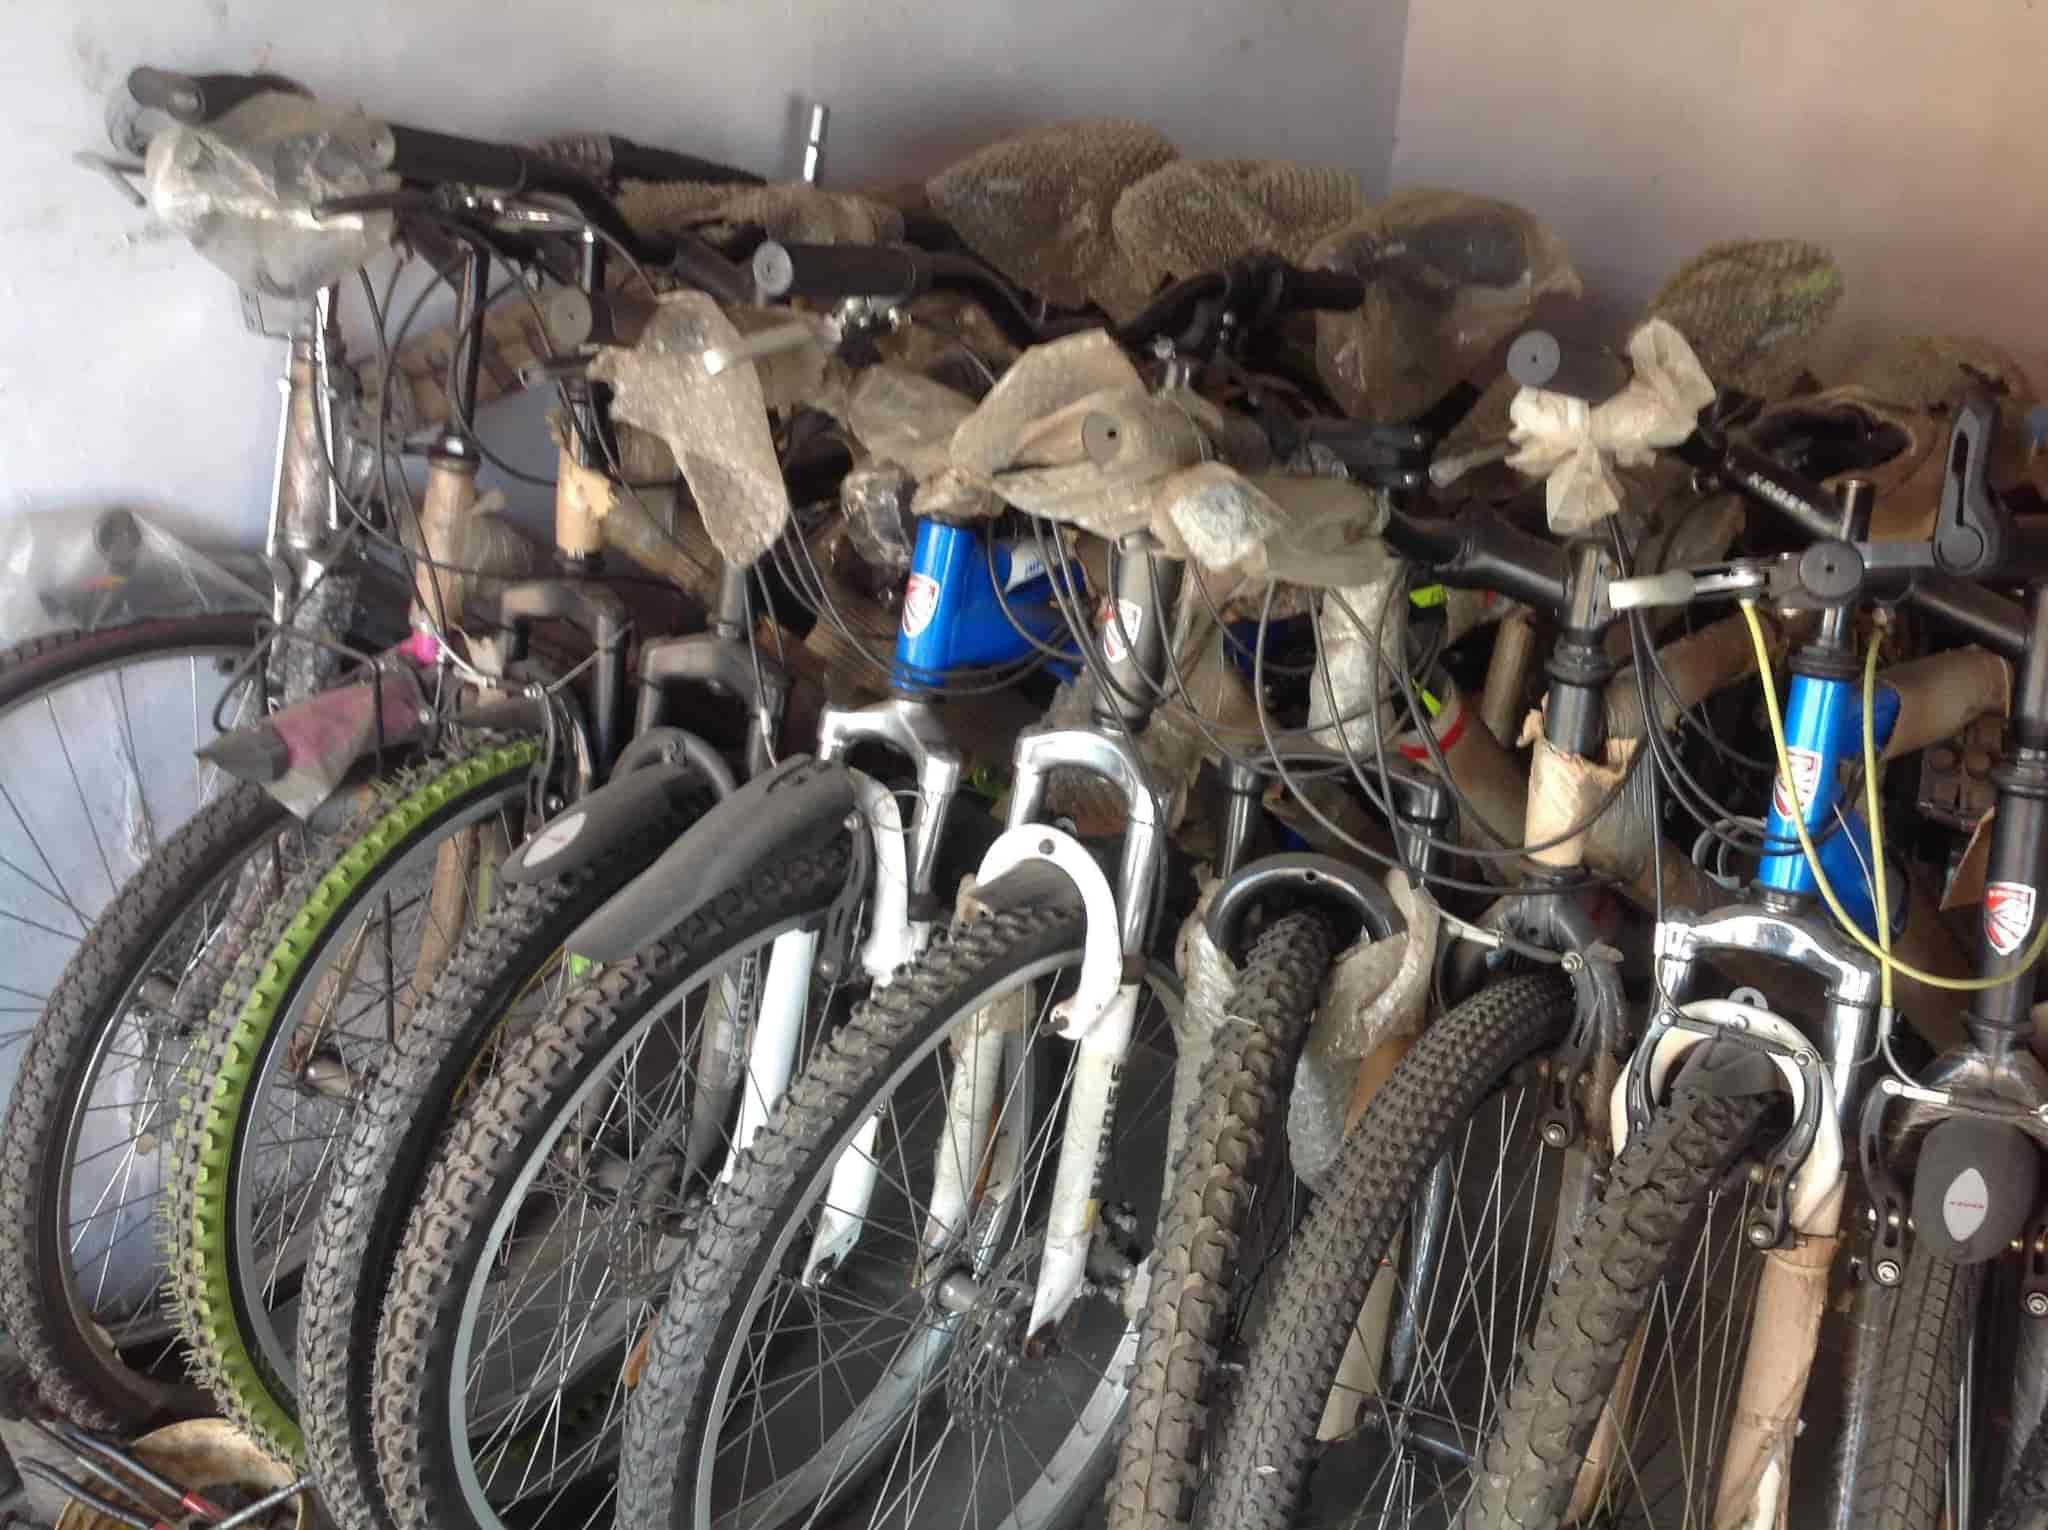 Housie Cycle Stop Vasai West Bicycle Dealers In Mumbai Justdial